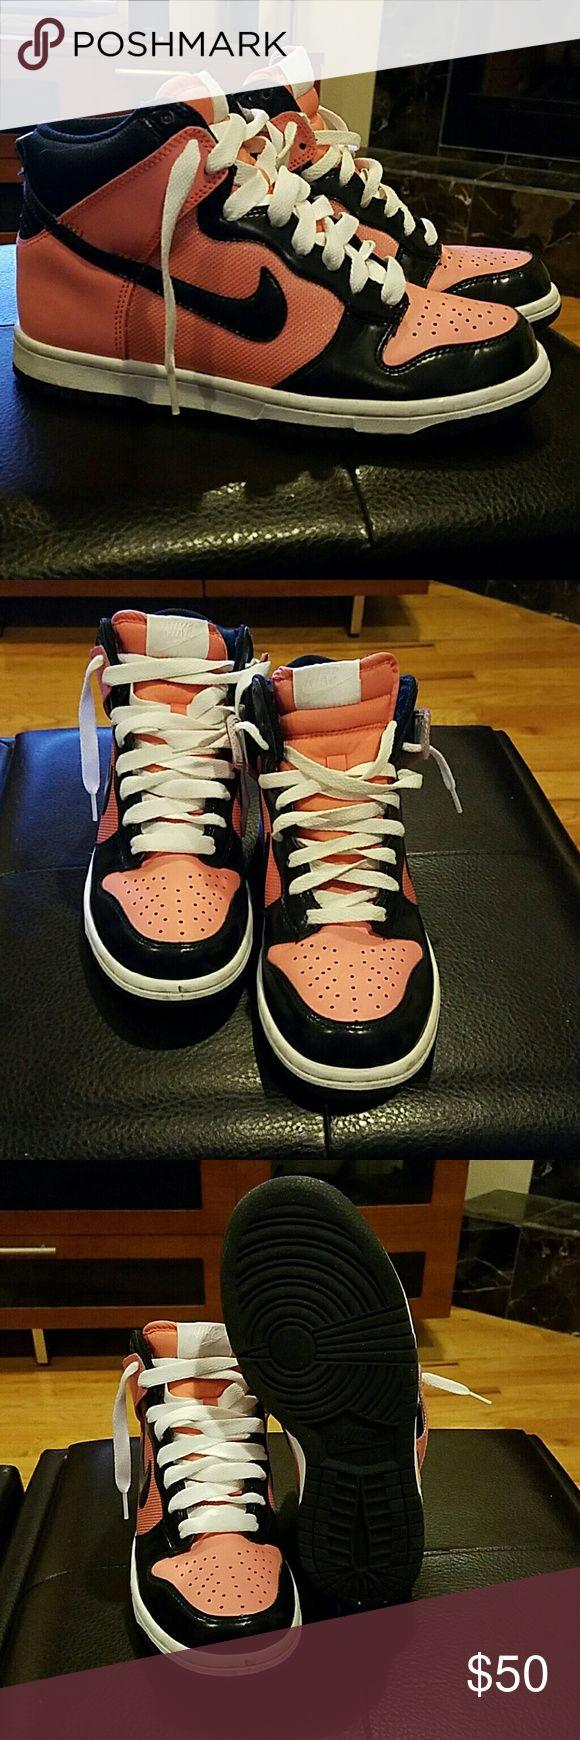 Nike dunks sz 7 Lightly worn. No box. Super comfy. High tops Shoes